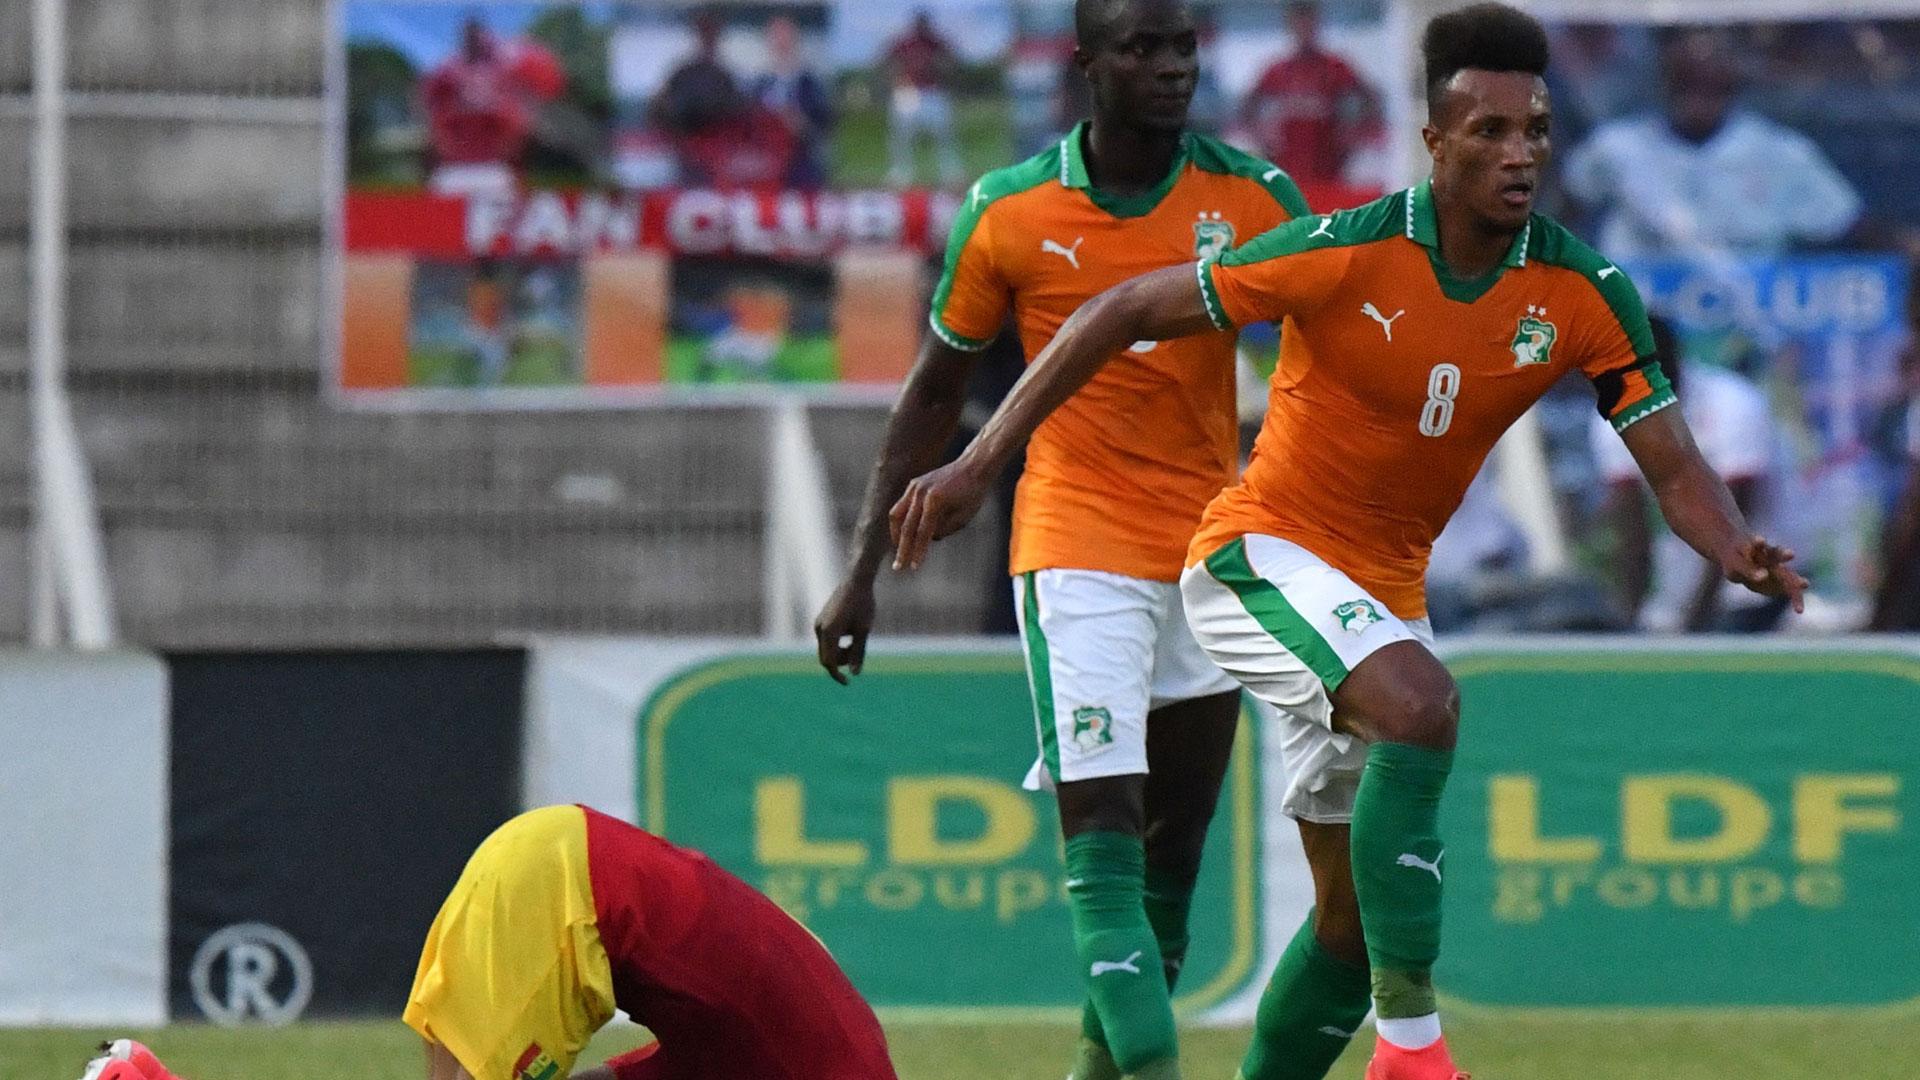 Marokko Vs Elfenbeinküste Live Stream